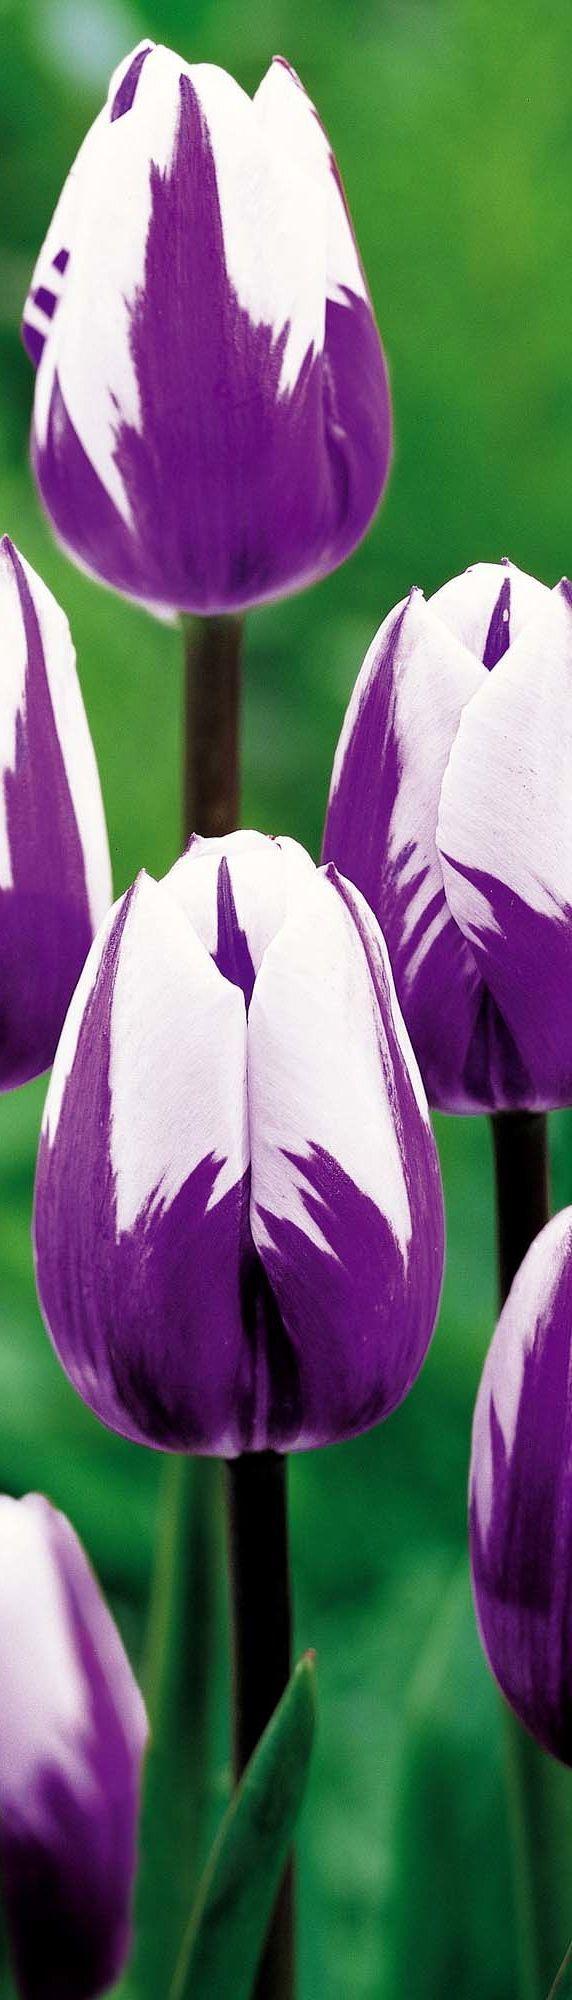 Found on media-cache-ec0 pinimg comPurple And White Tulips